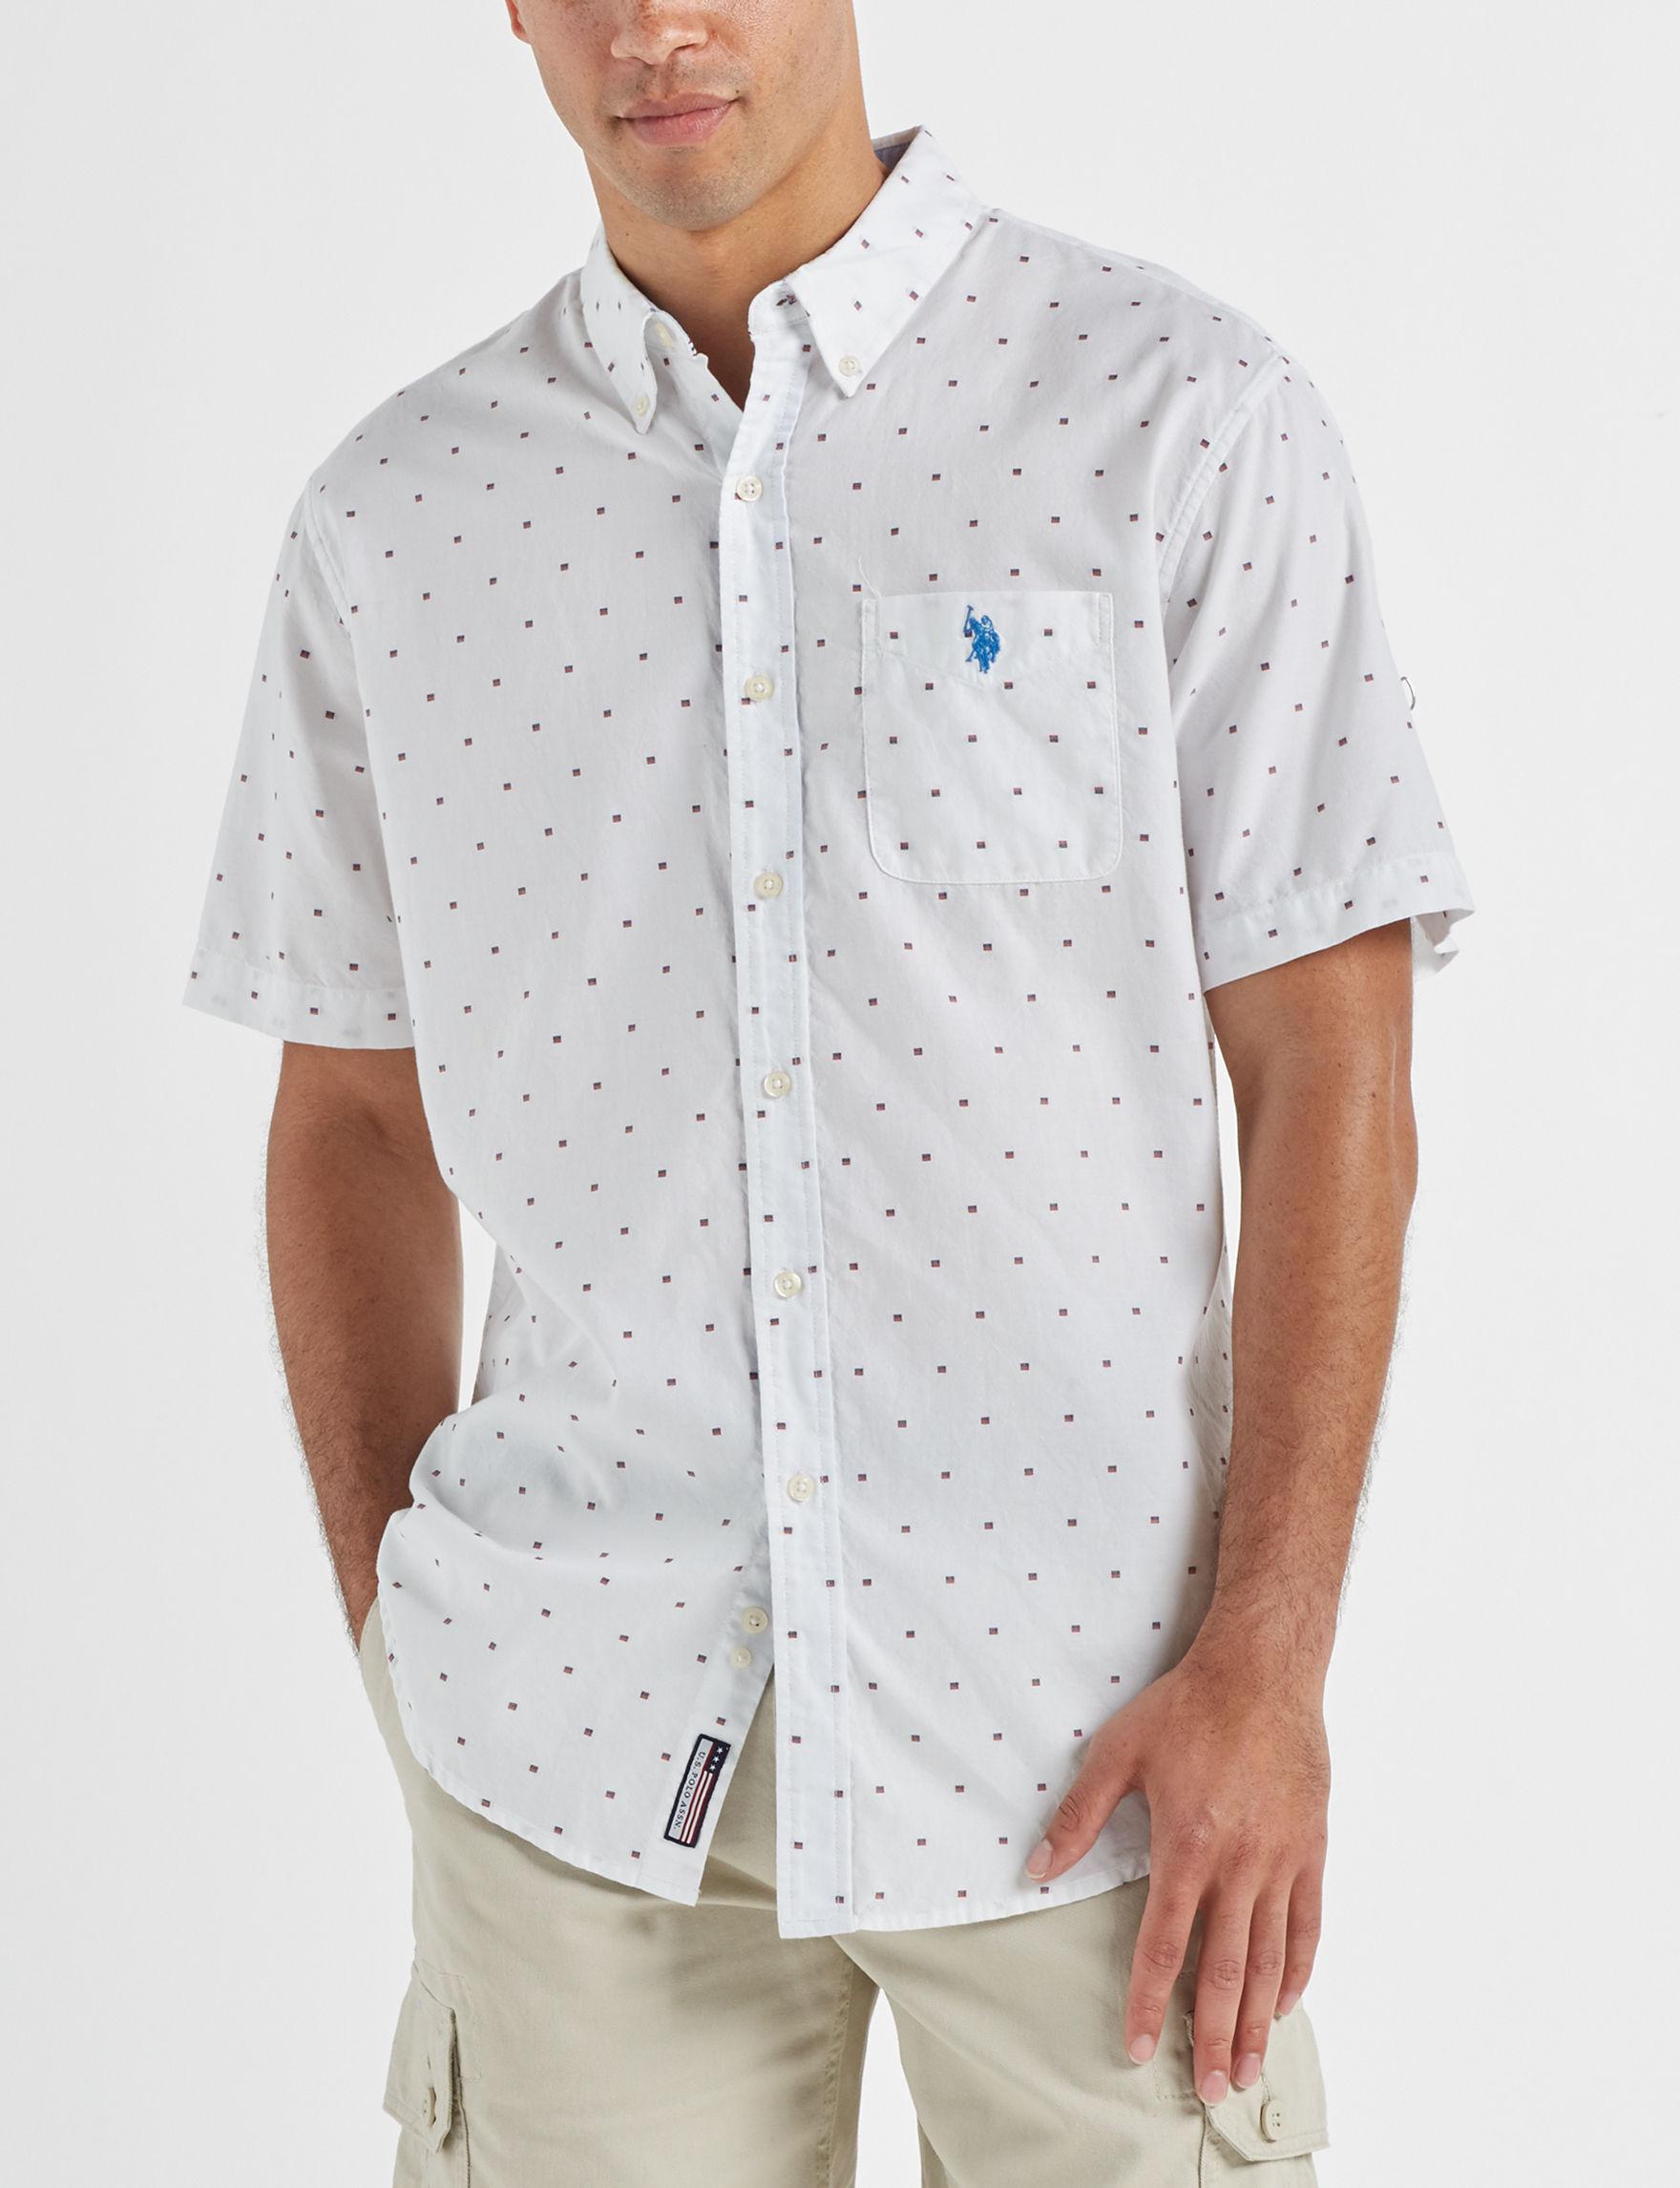 U.S. Polo Assn. White / Multi Casual Button Down Shirts